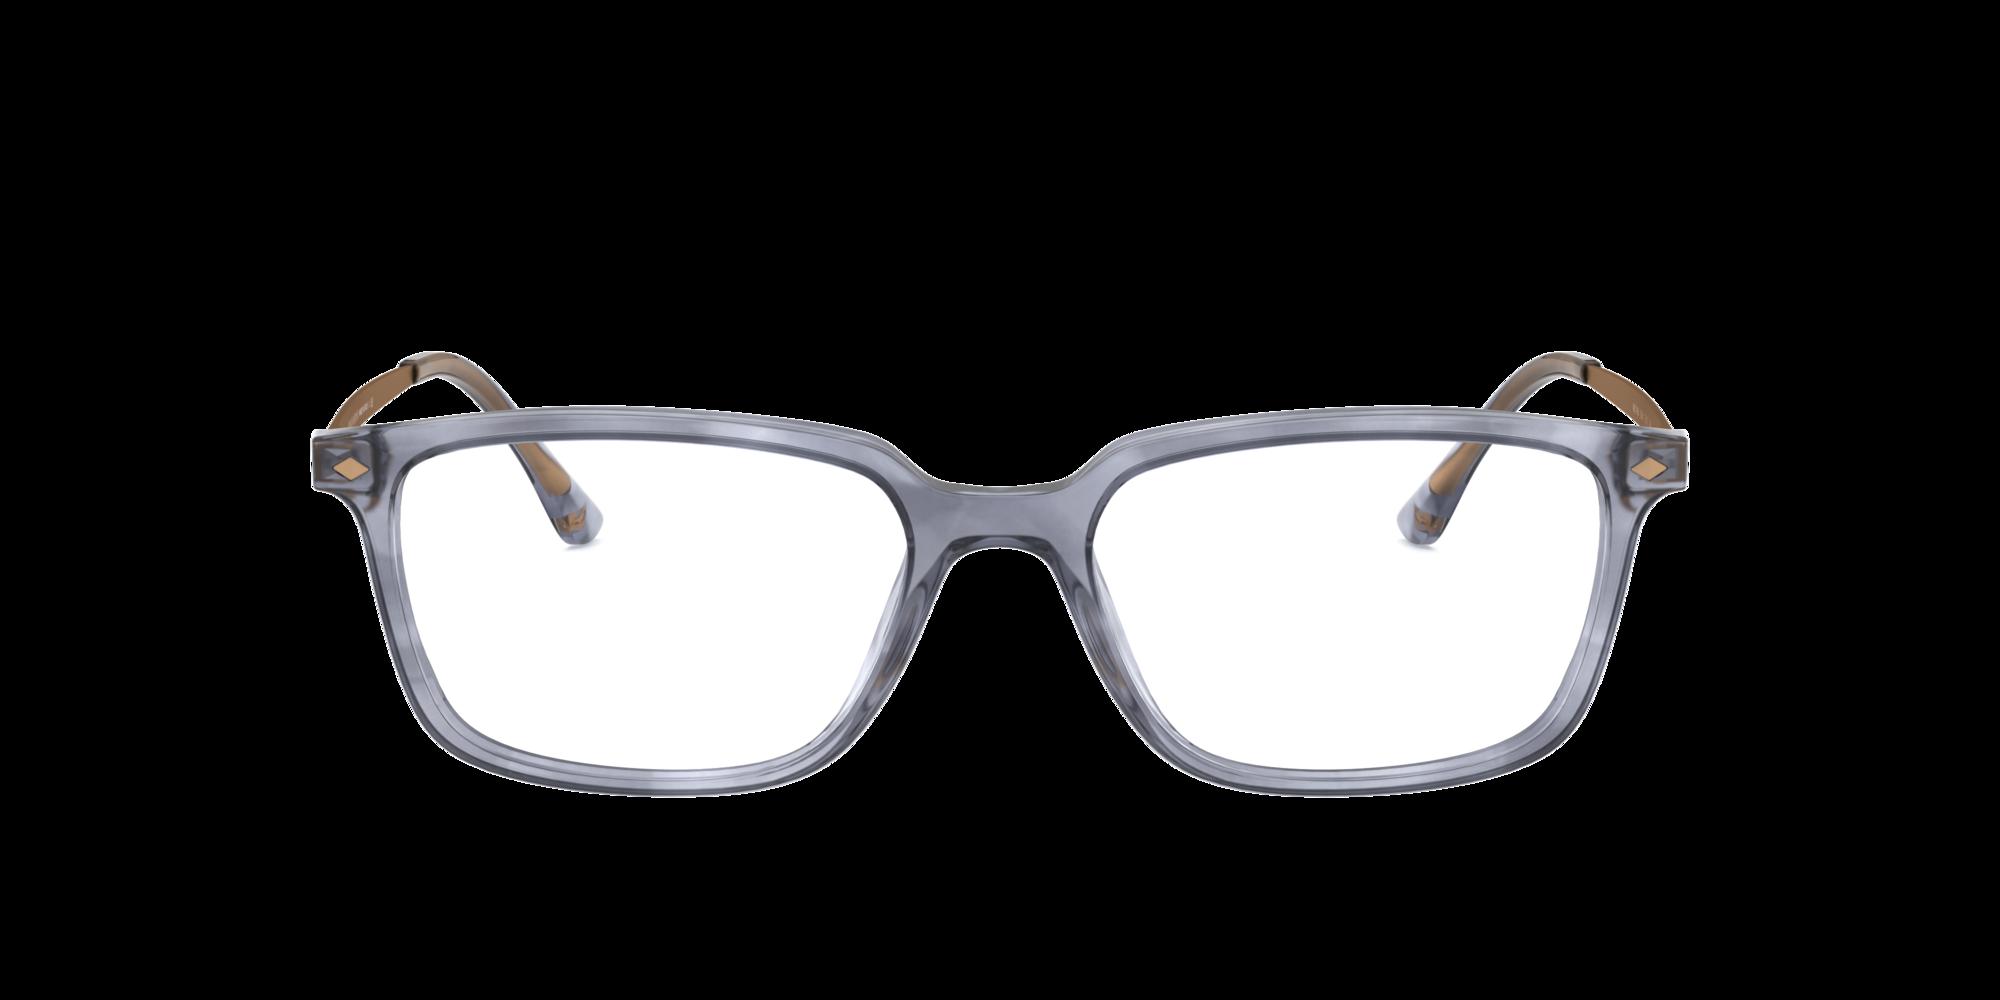 Image for AR7183 from LensCrafters | Glasses, Prescription Glasses Online, Eyewear